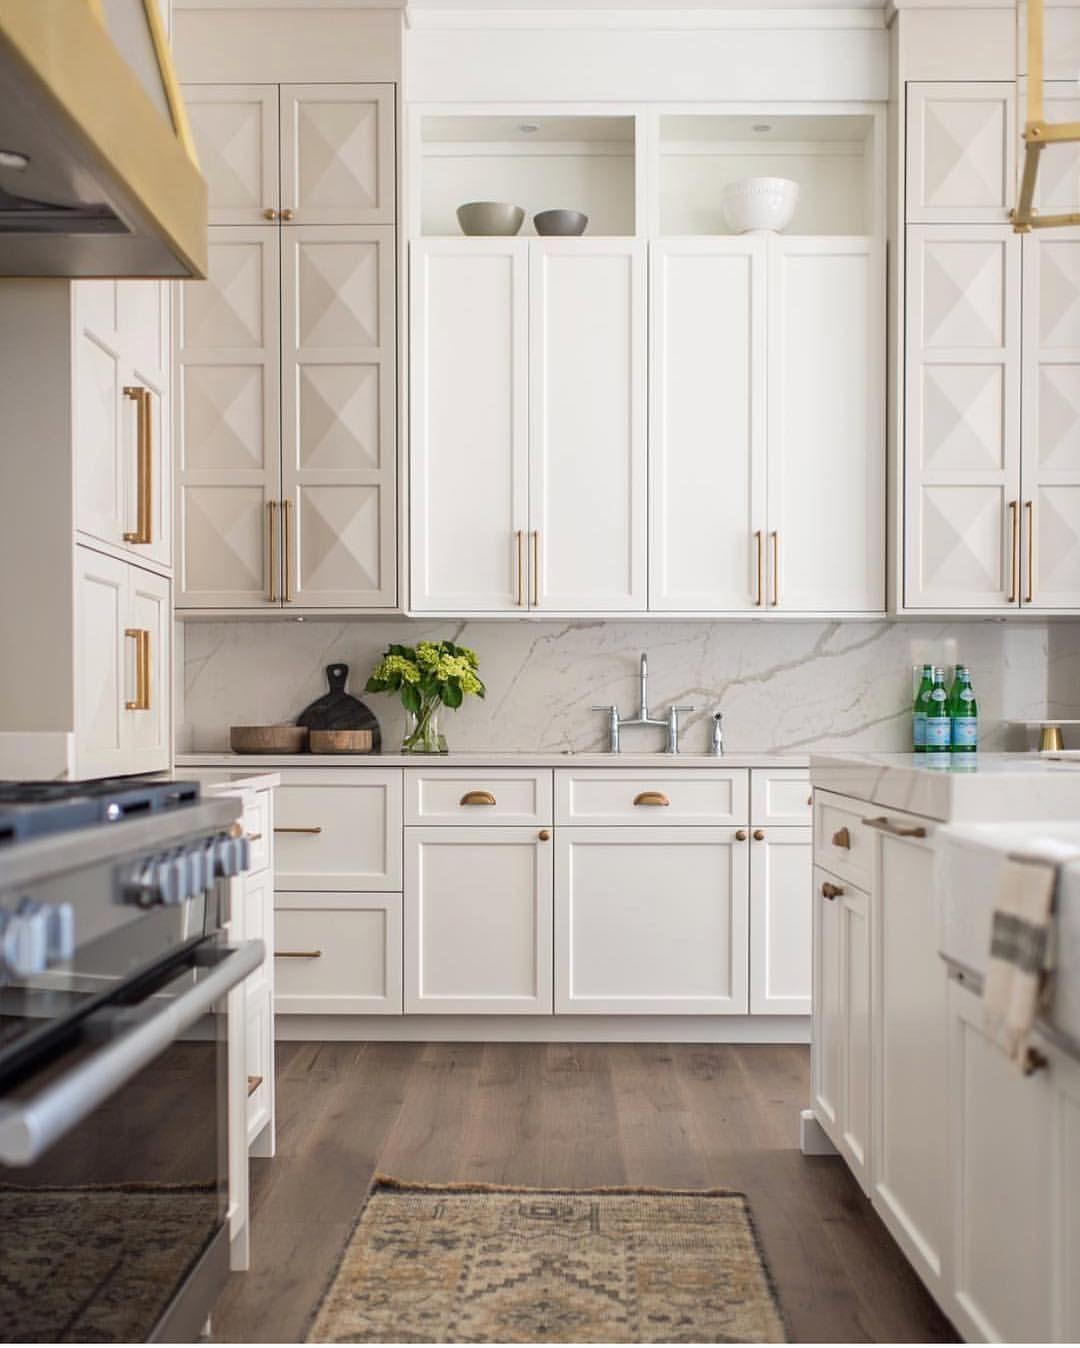 Beper Juice Extractor Body And Filter In Steel Interior Design Kitchen Kitchen Cabinet Design Kitchen Trends